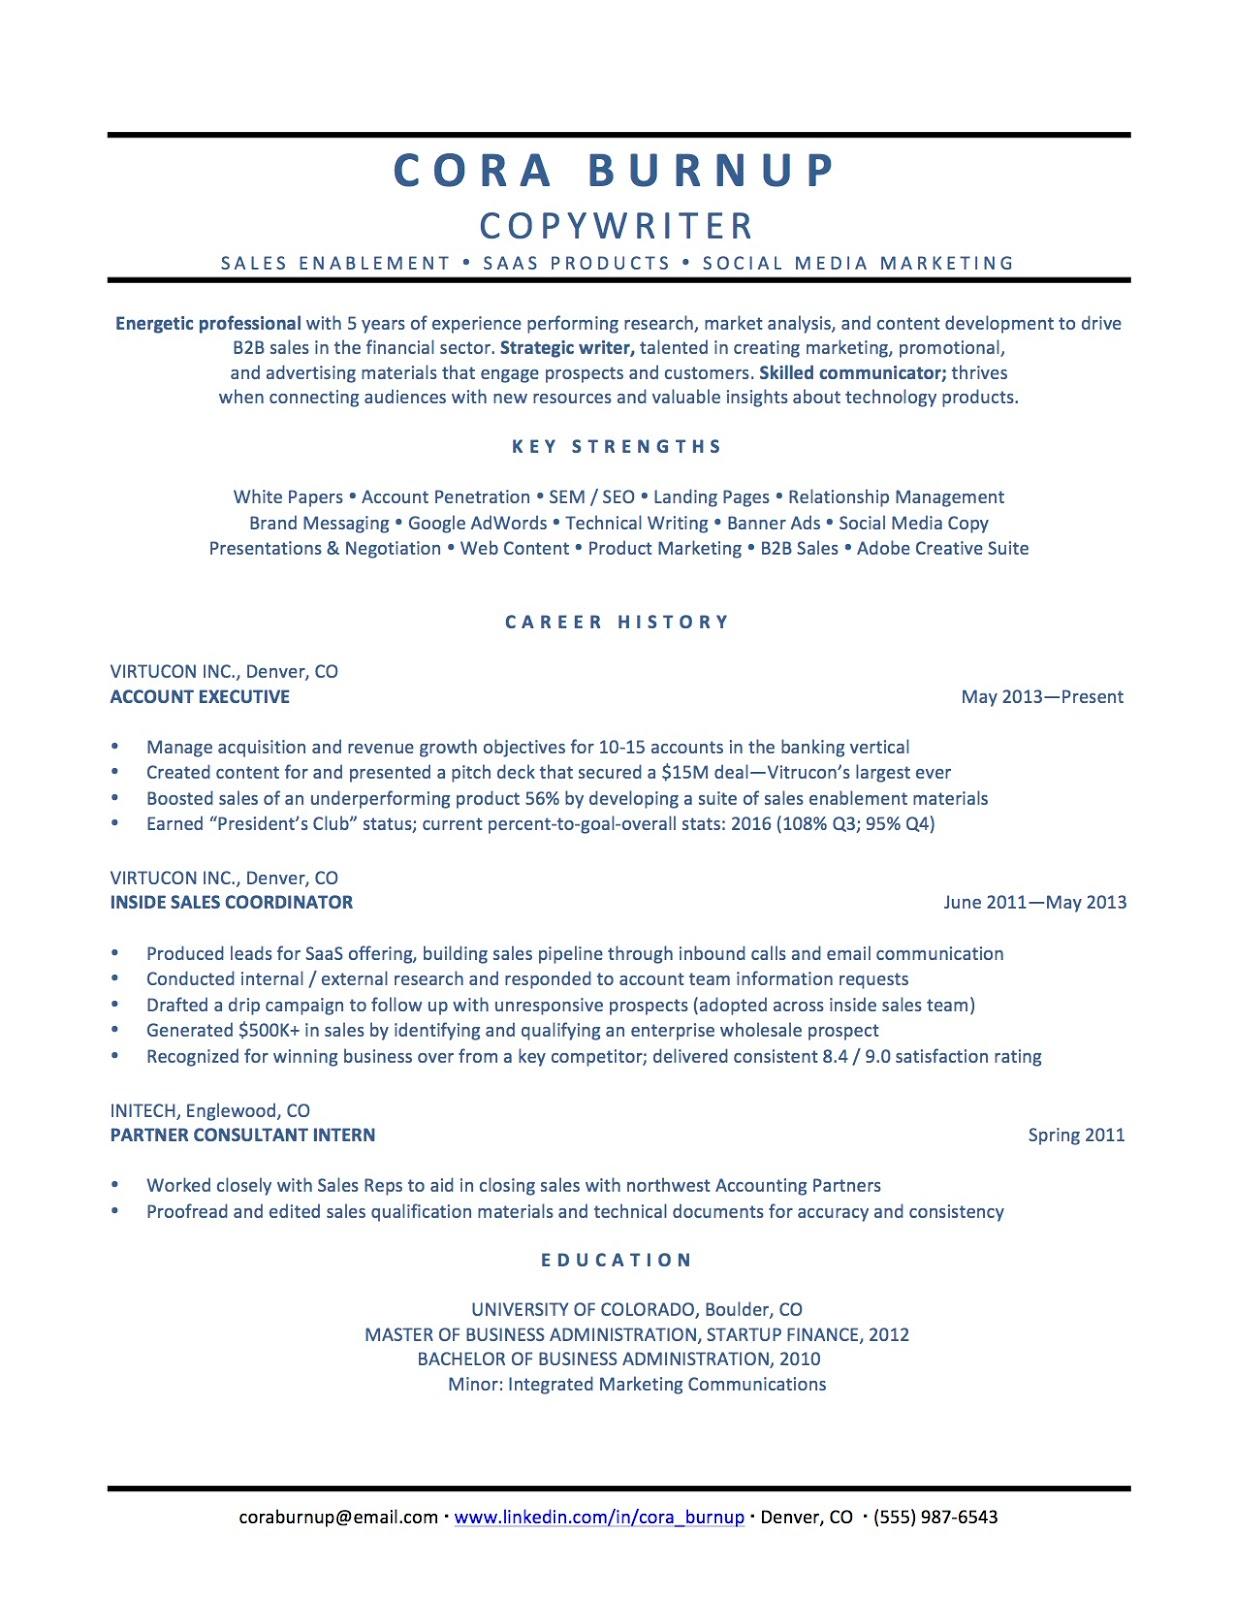 copywriter cv example, copywriter cv examples, copywriter cv examples uk, copywriter cv example 2019, copywriter cv template, copywriter cv template word, creative copywriter cv example, copywriter cv example, cv examples for copywriter,